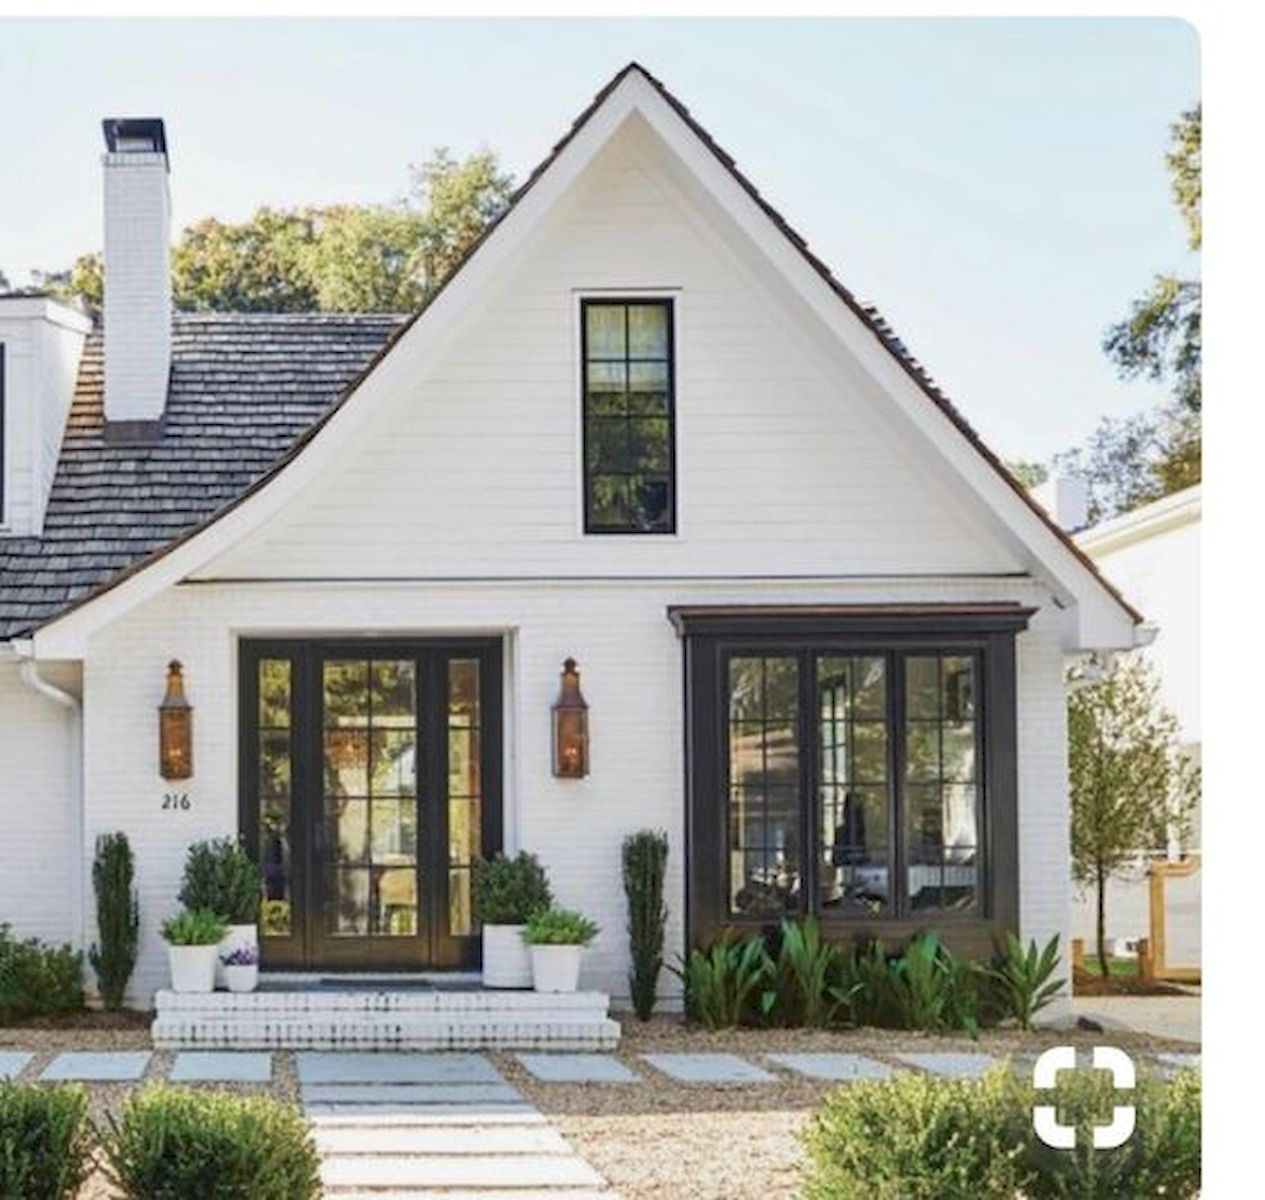 33 Beautiful Modern Farmhouse Exterior Design Ideas 20 In Small Modern Farmhouse Exterior In 2020 Modern Farmhouse Exterior Modern Cottage White Farmhouse Exterior